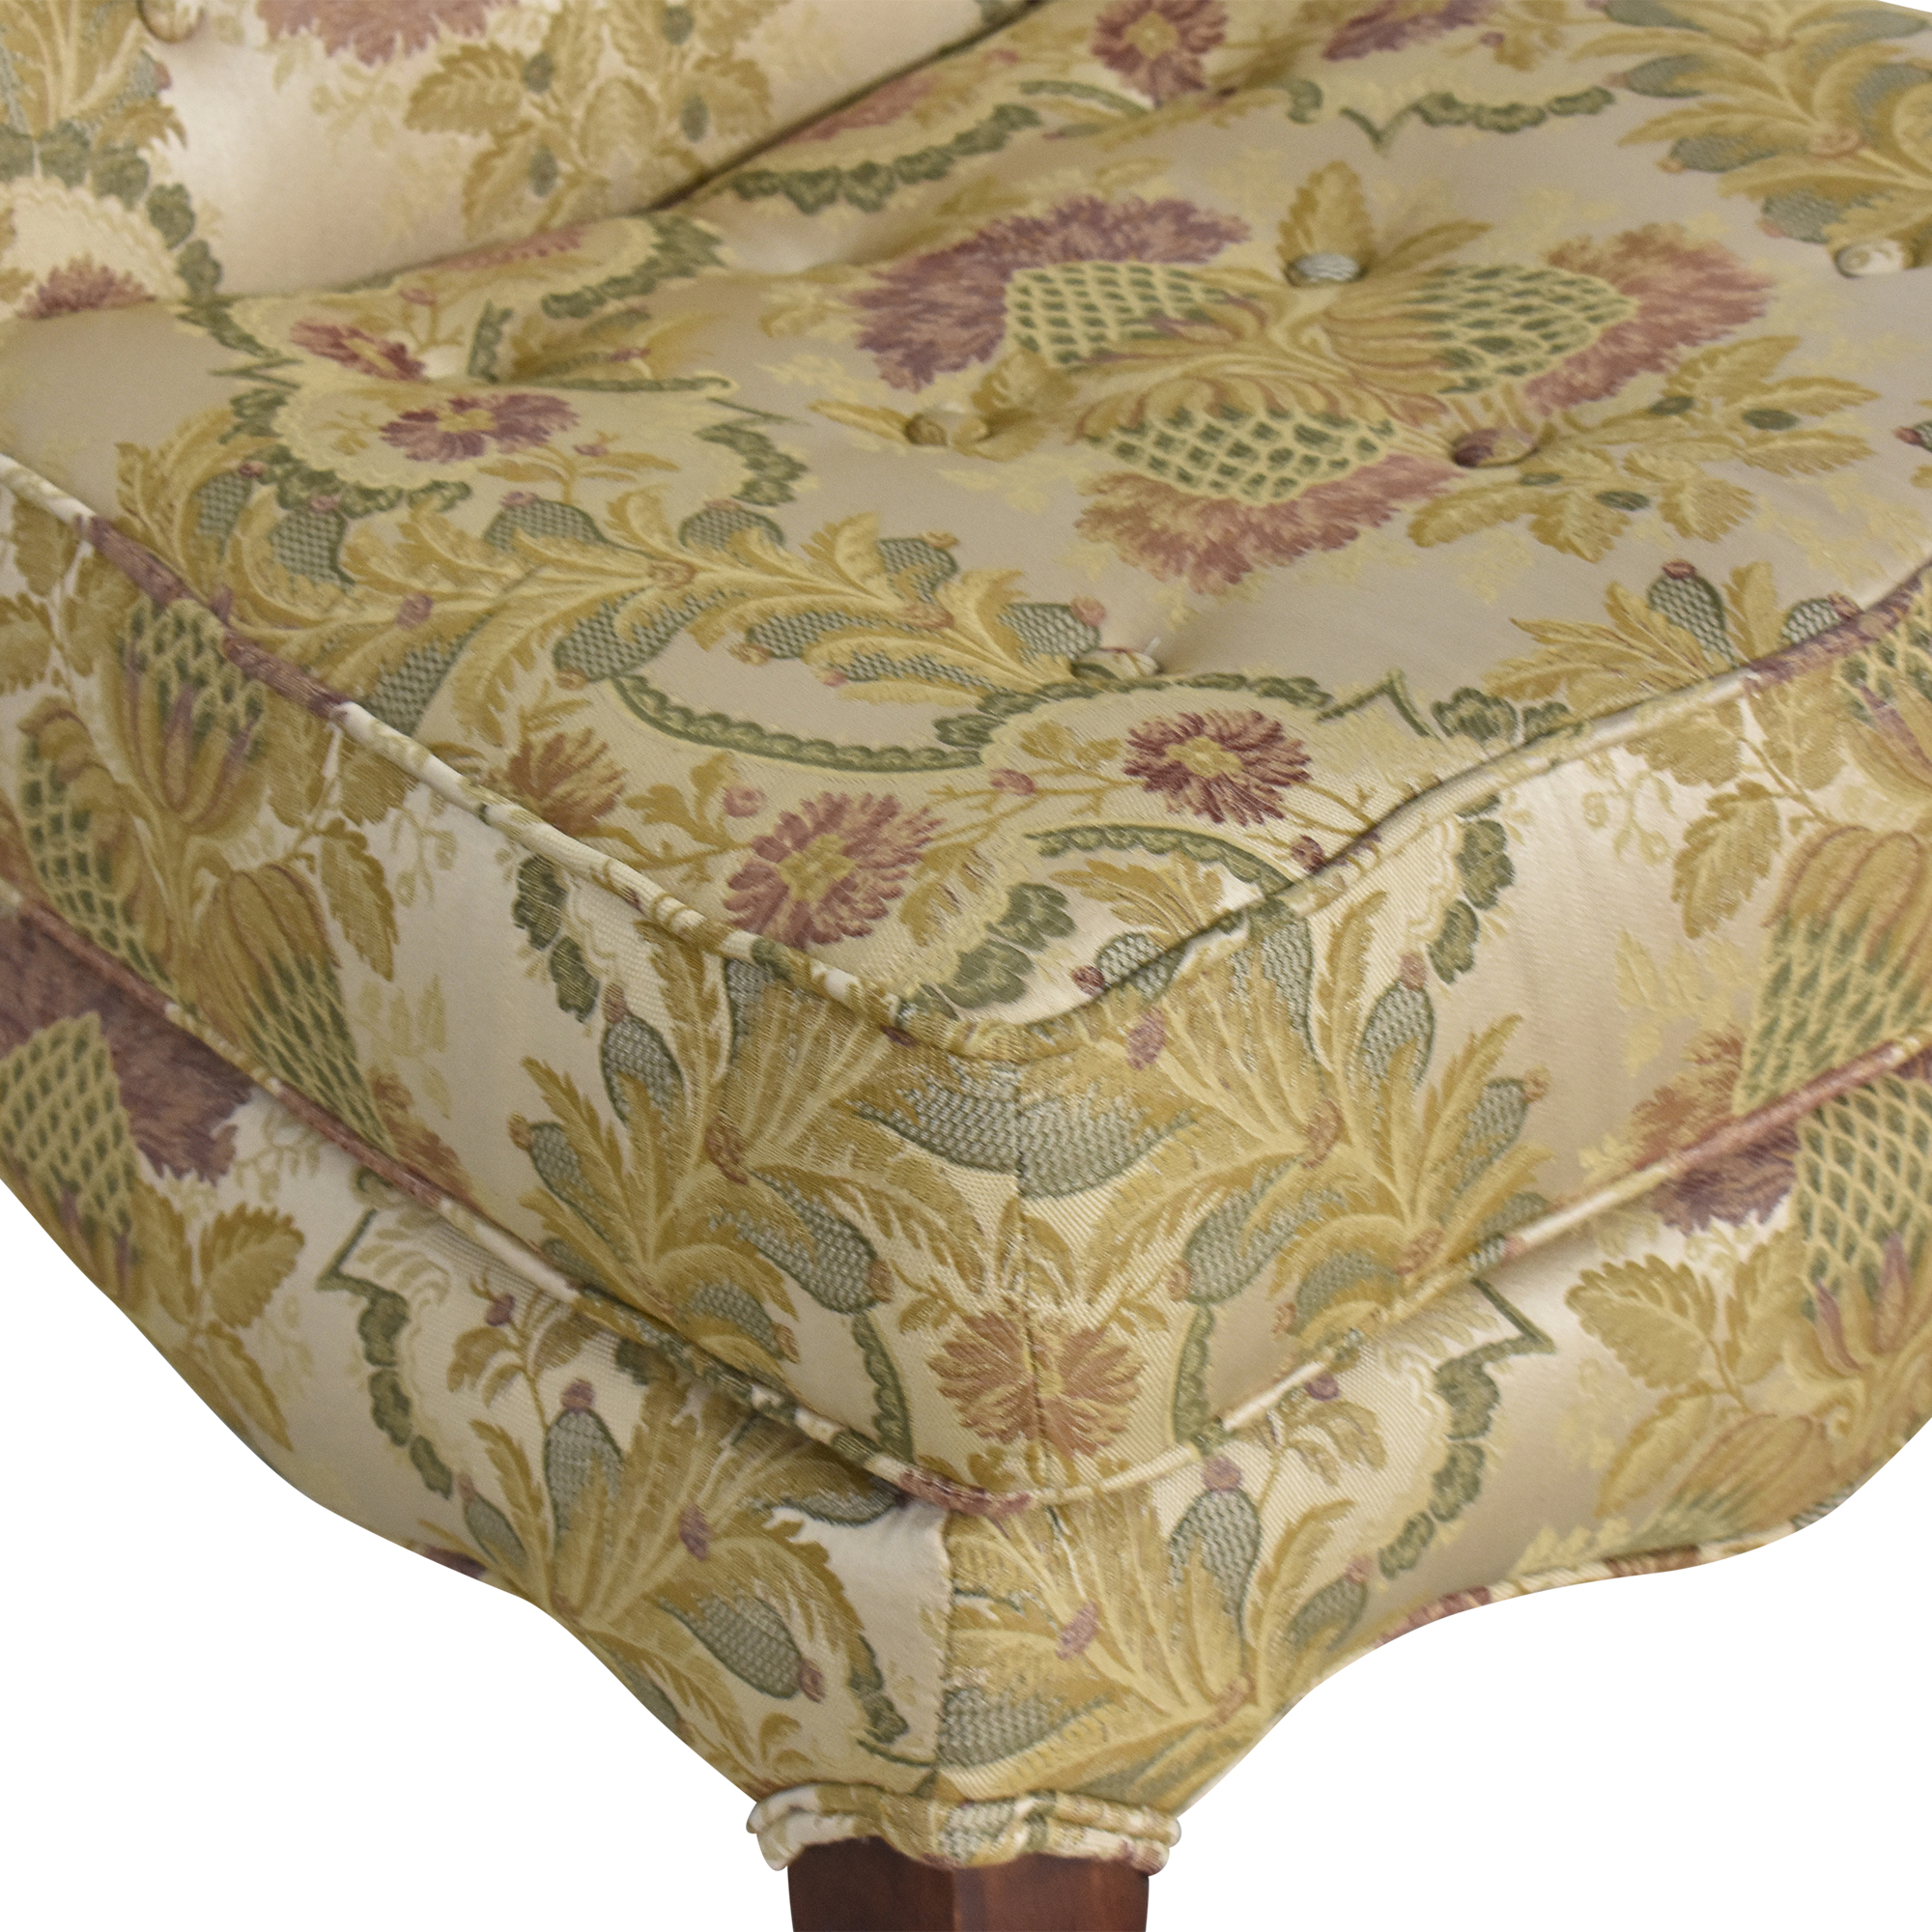 Domain Home Domain Home Slipper Chair second hand